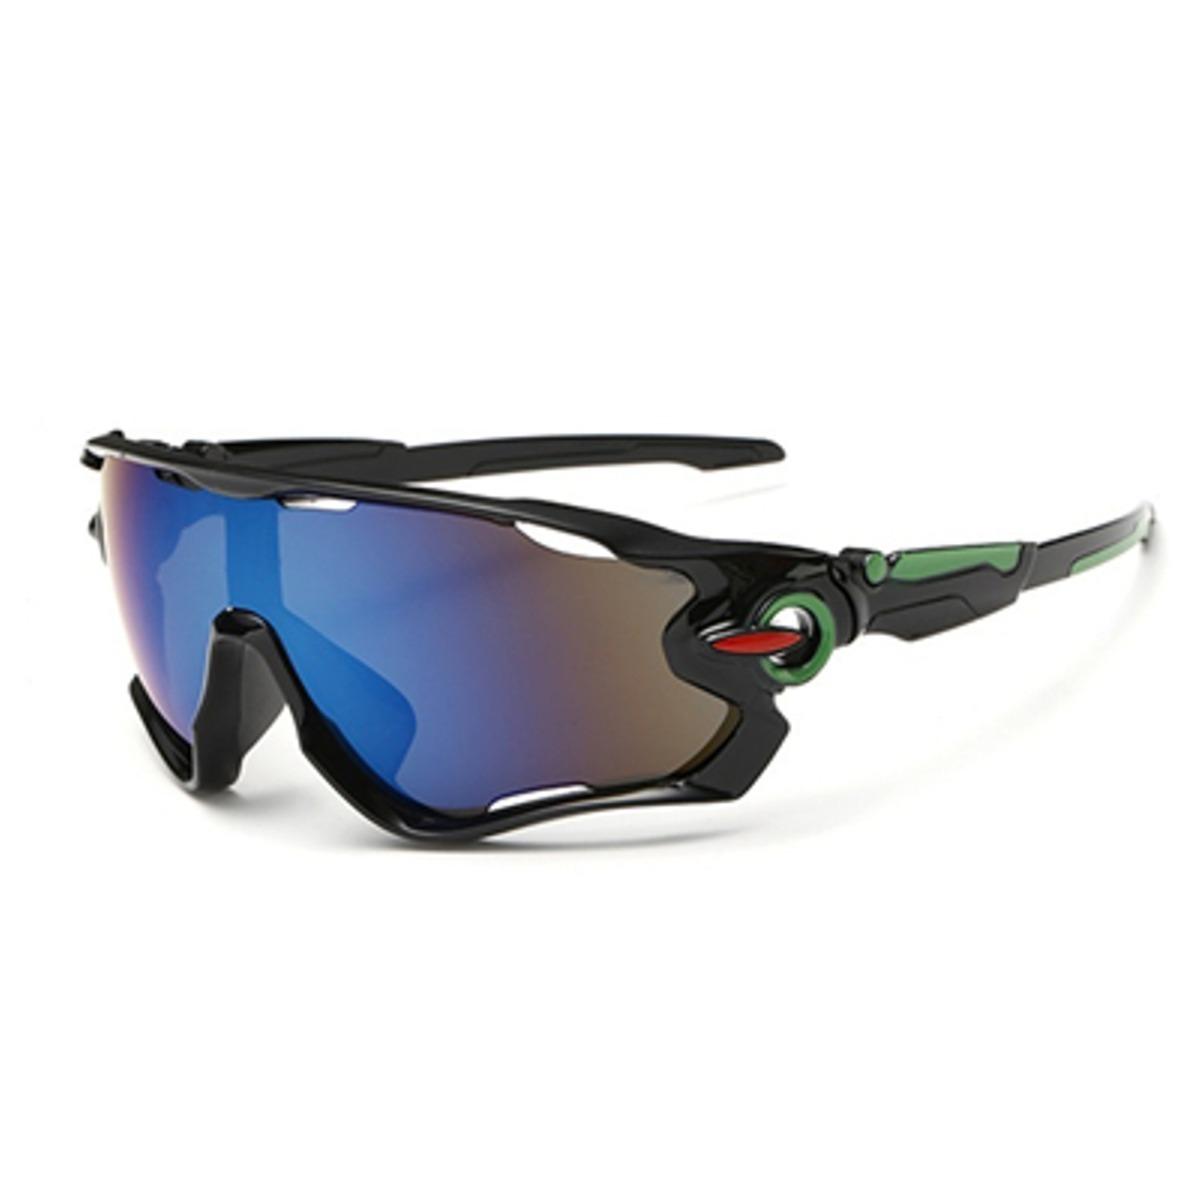 d26a6789be78f oculos de sol estilo jawbreaker bike andar-bike. Carregando zoom.